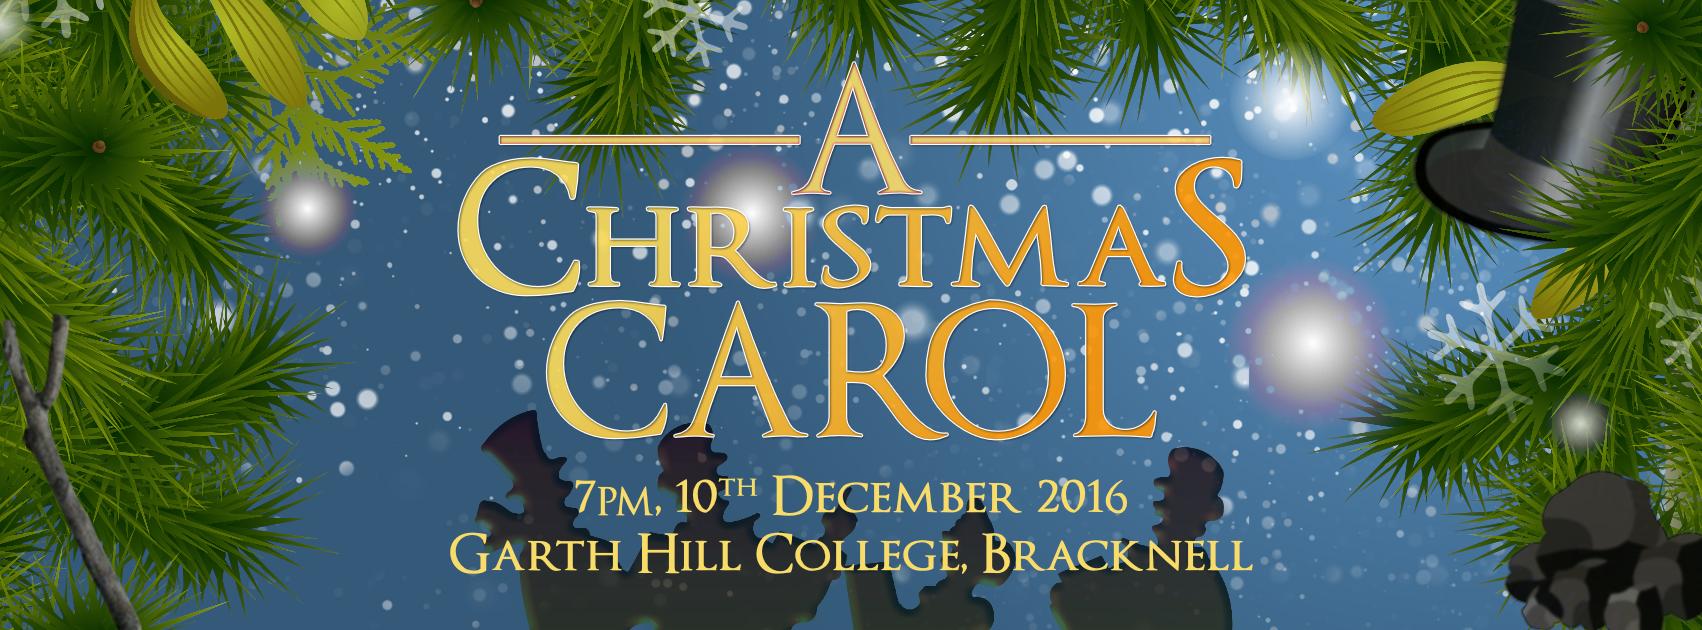 A Christmas Carol show banner